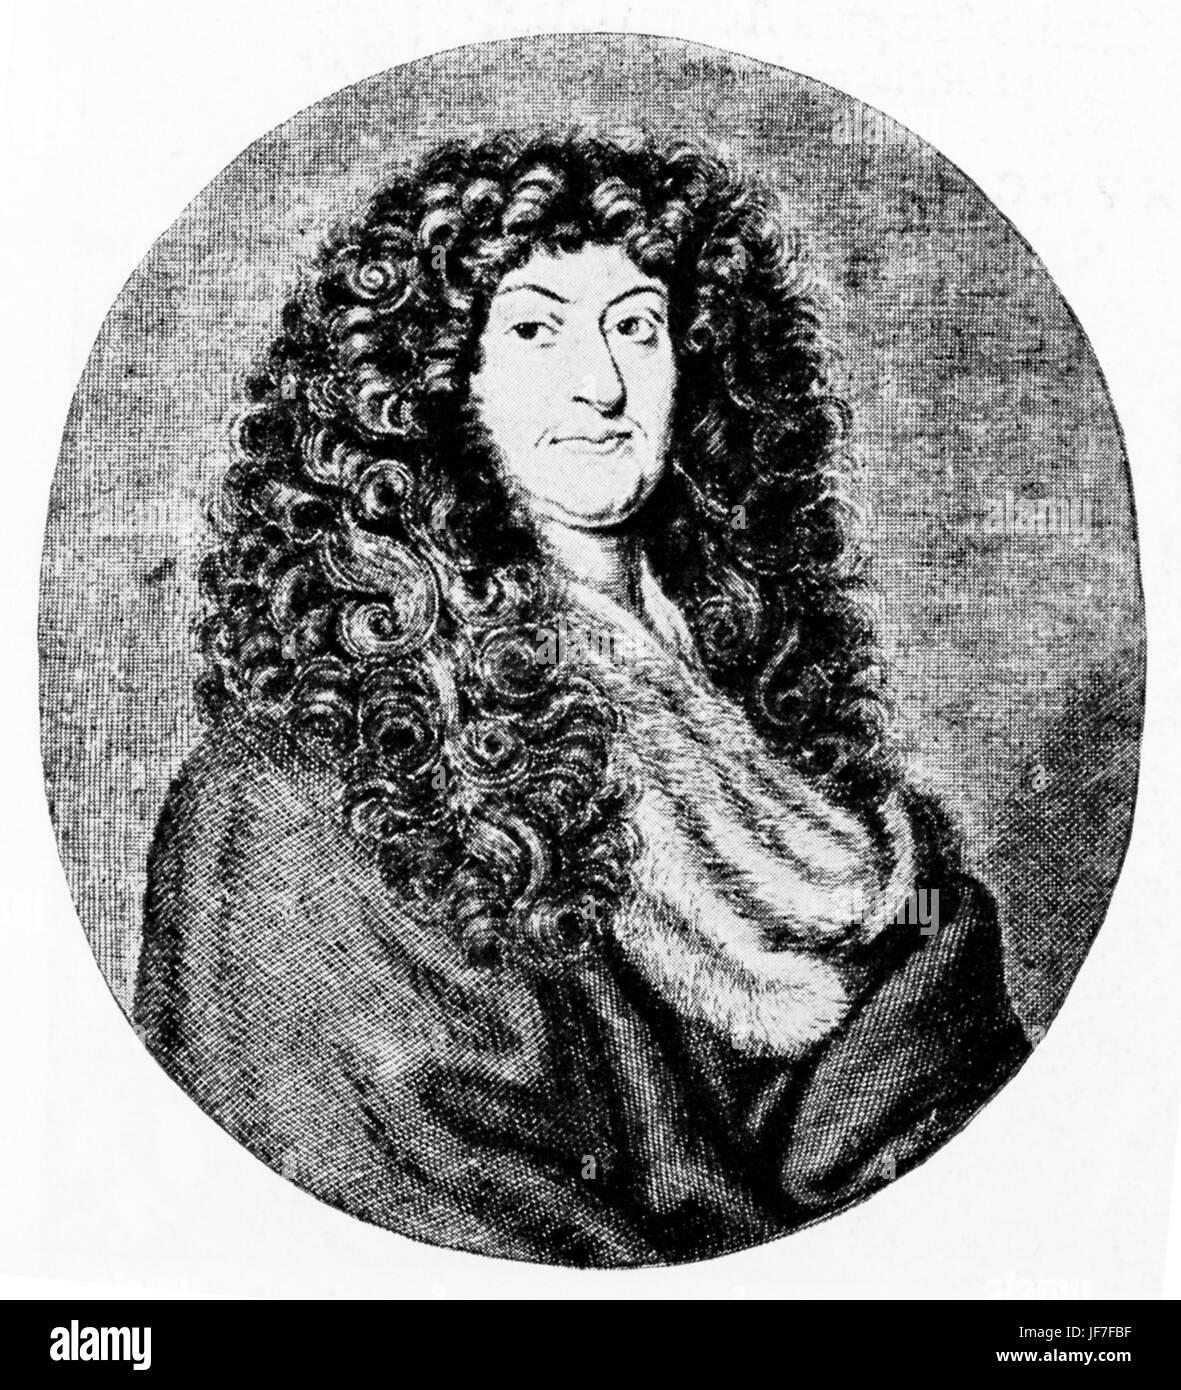 Johann Christoph Wagenseil, author of the book De civitate Noribergensi commentatio (1697). Engraving by Jacob Sandrart, - Stock Image